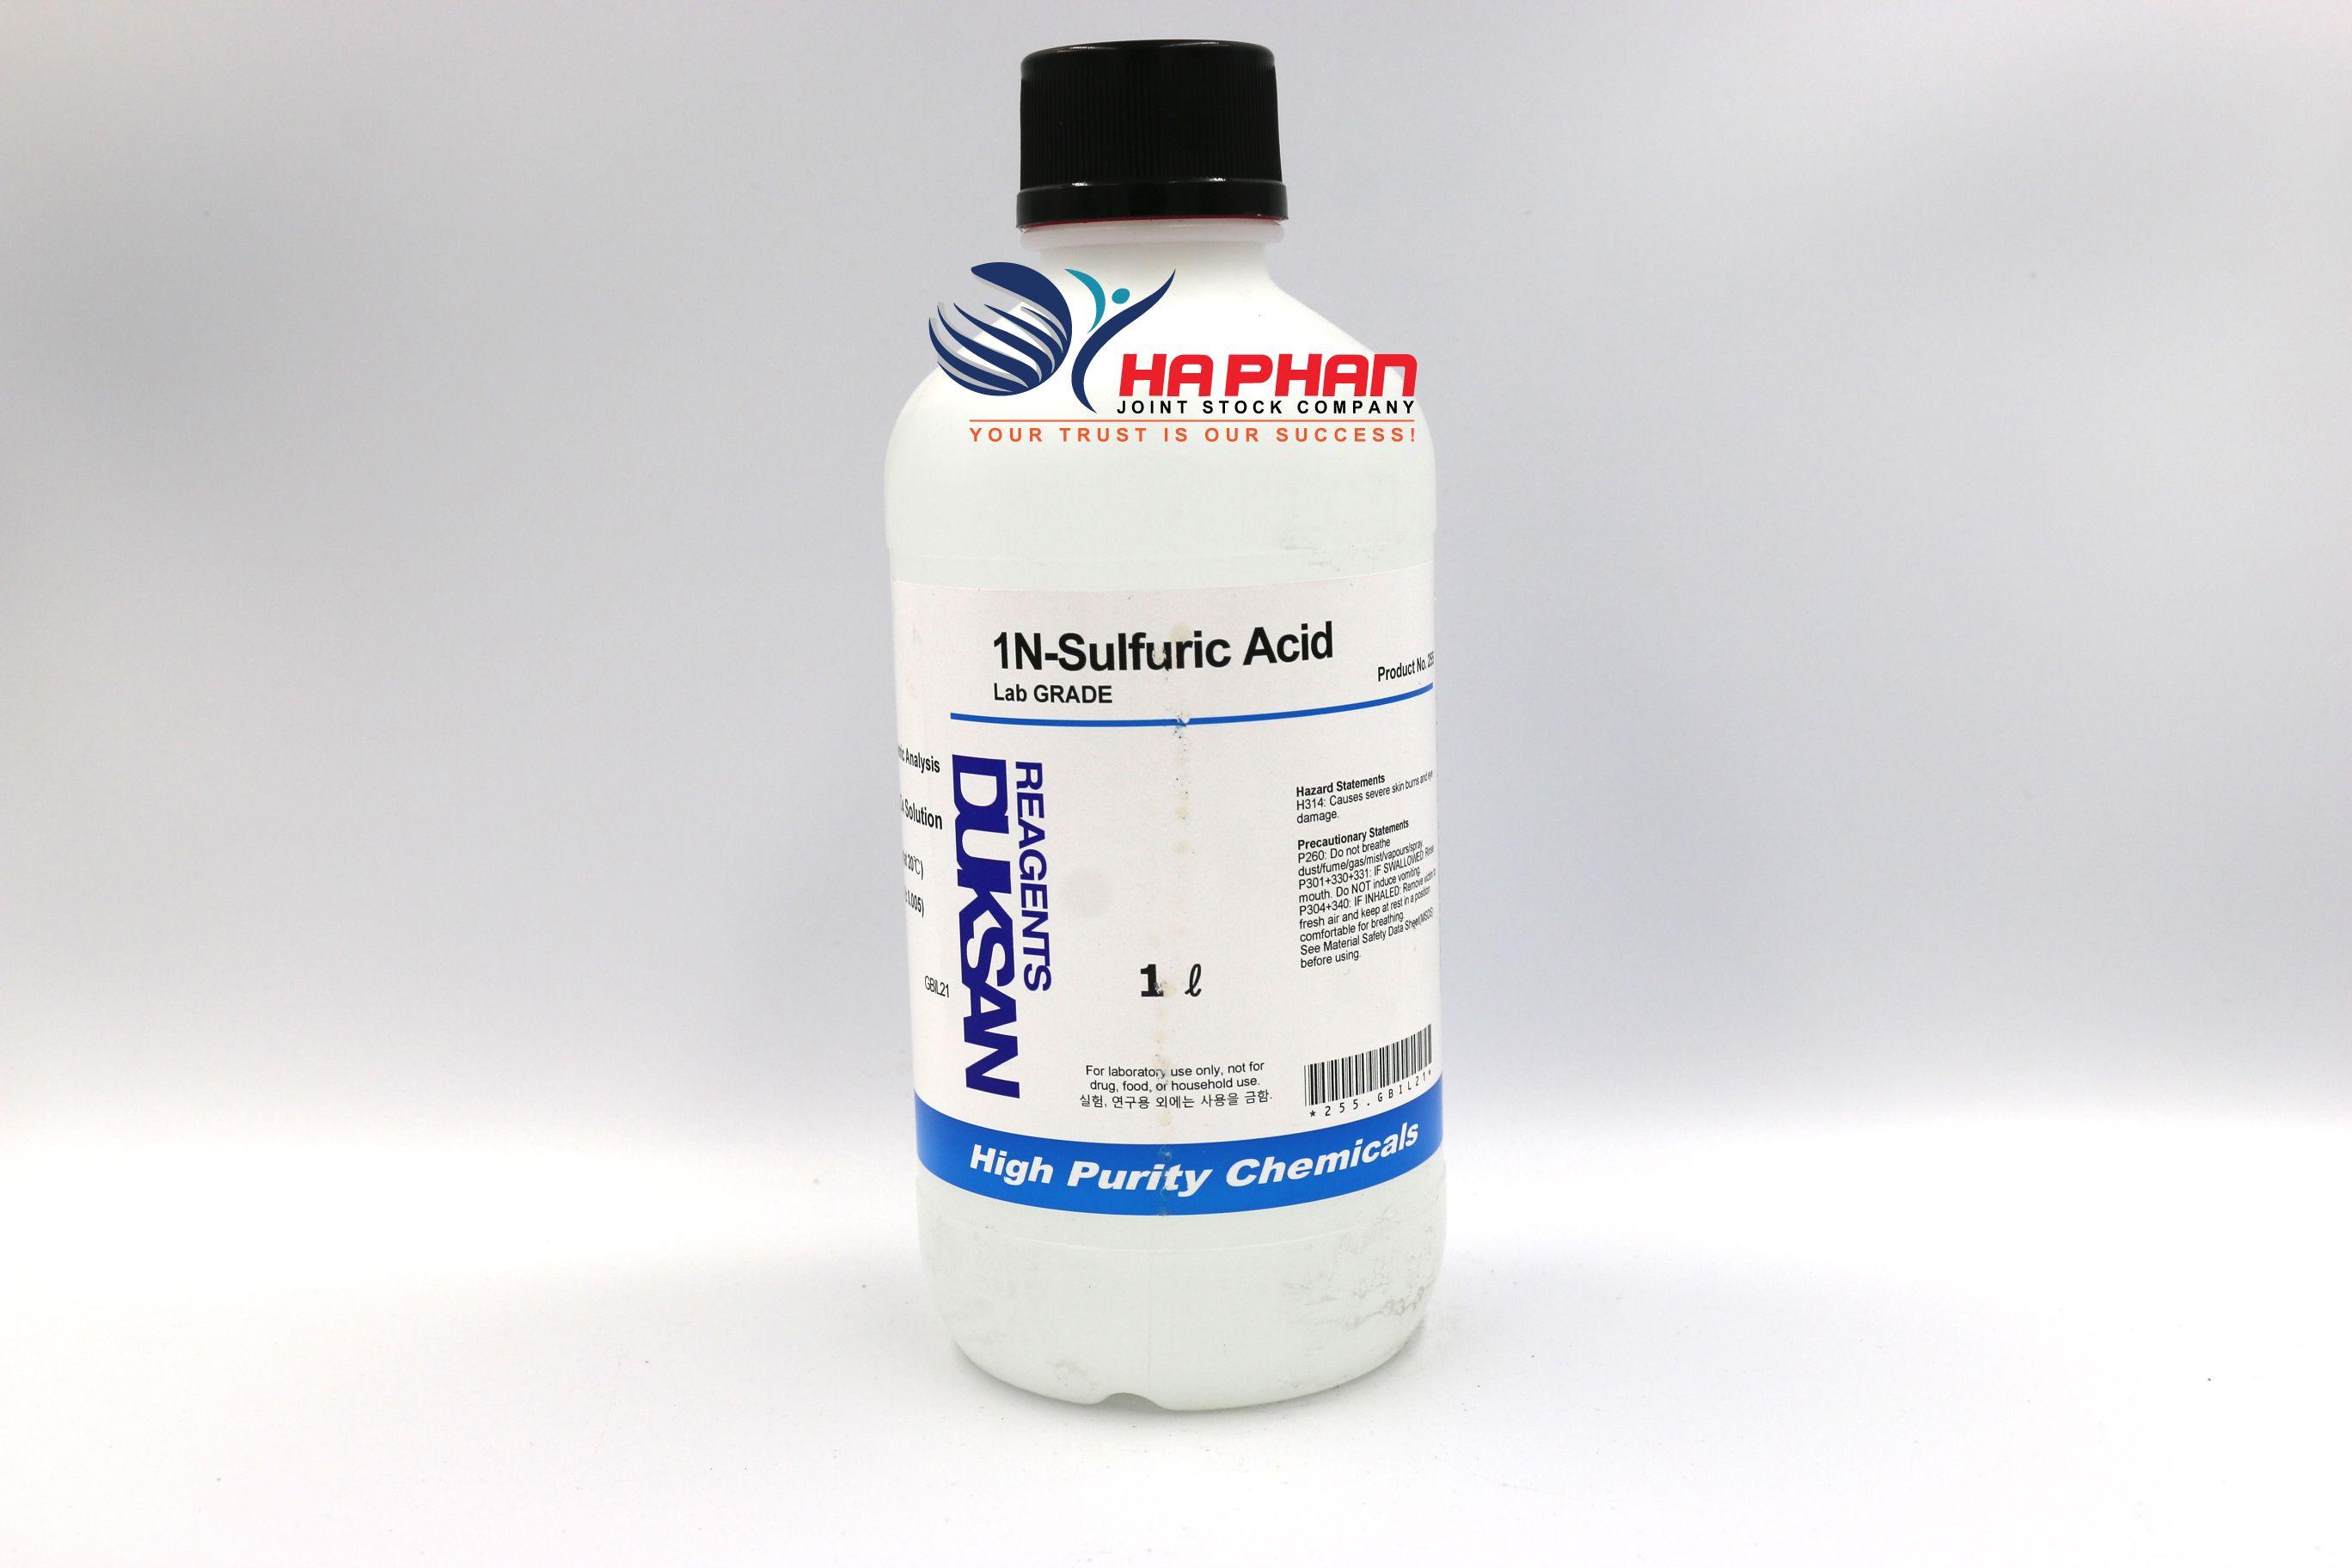 1N-Sulfuric Acid